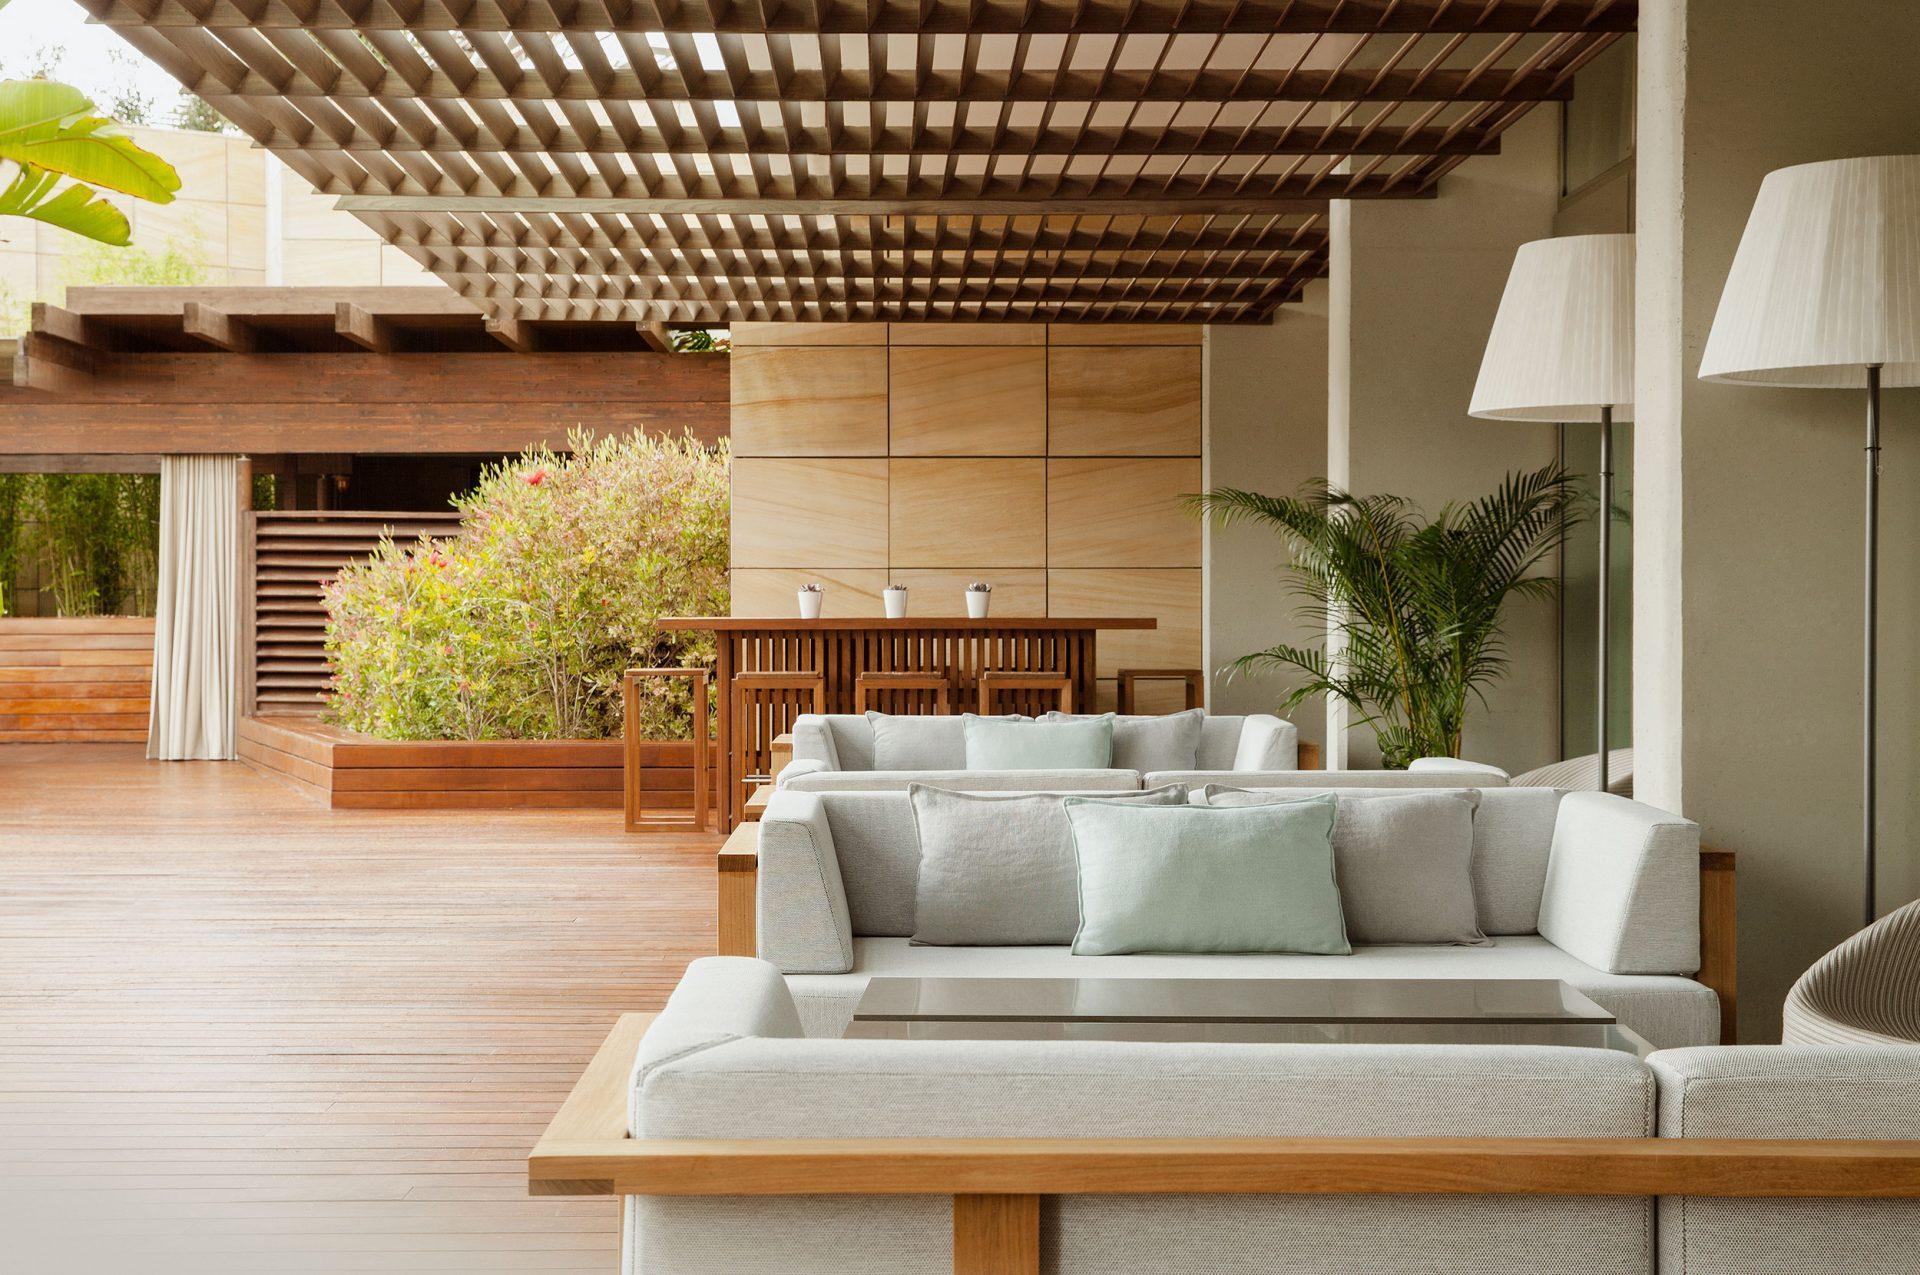 Ibiza Gran Hotel Gallery La Gaia Terrace Area2